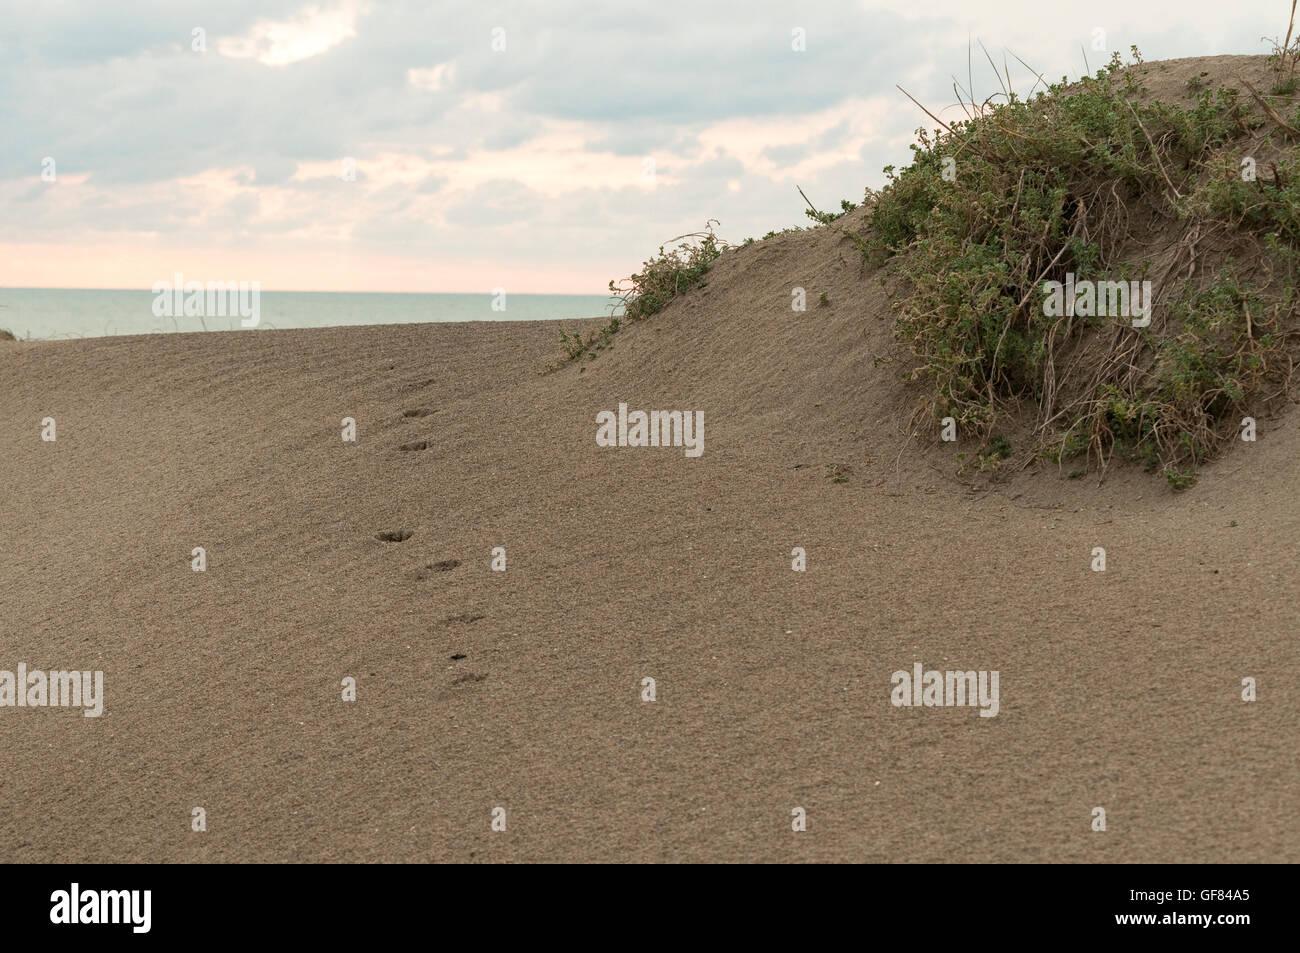 footprints on sand dunes - Stock Image